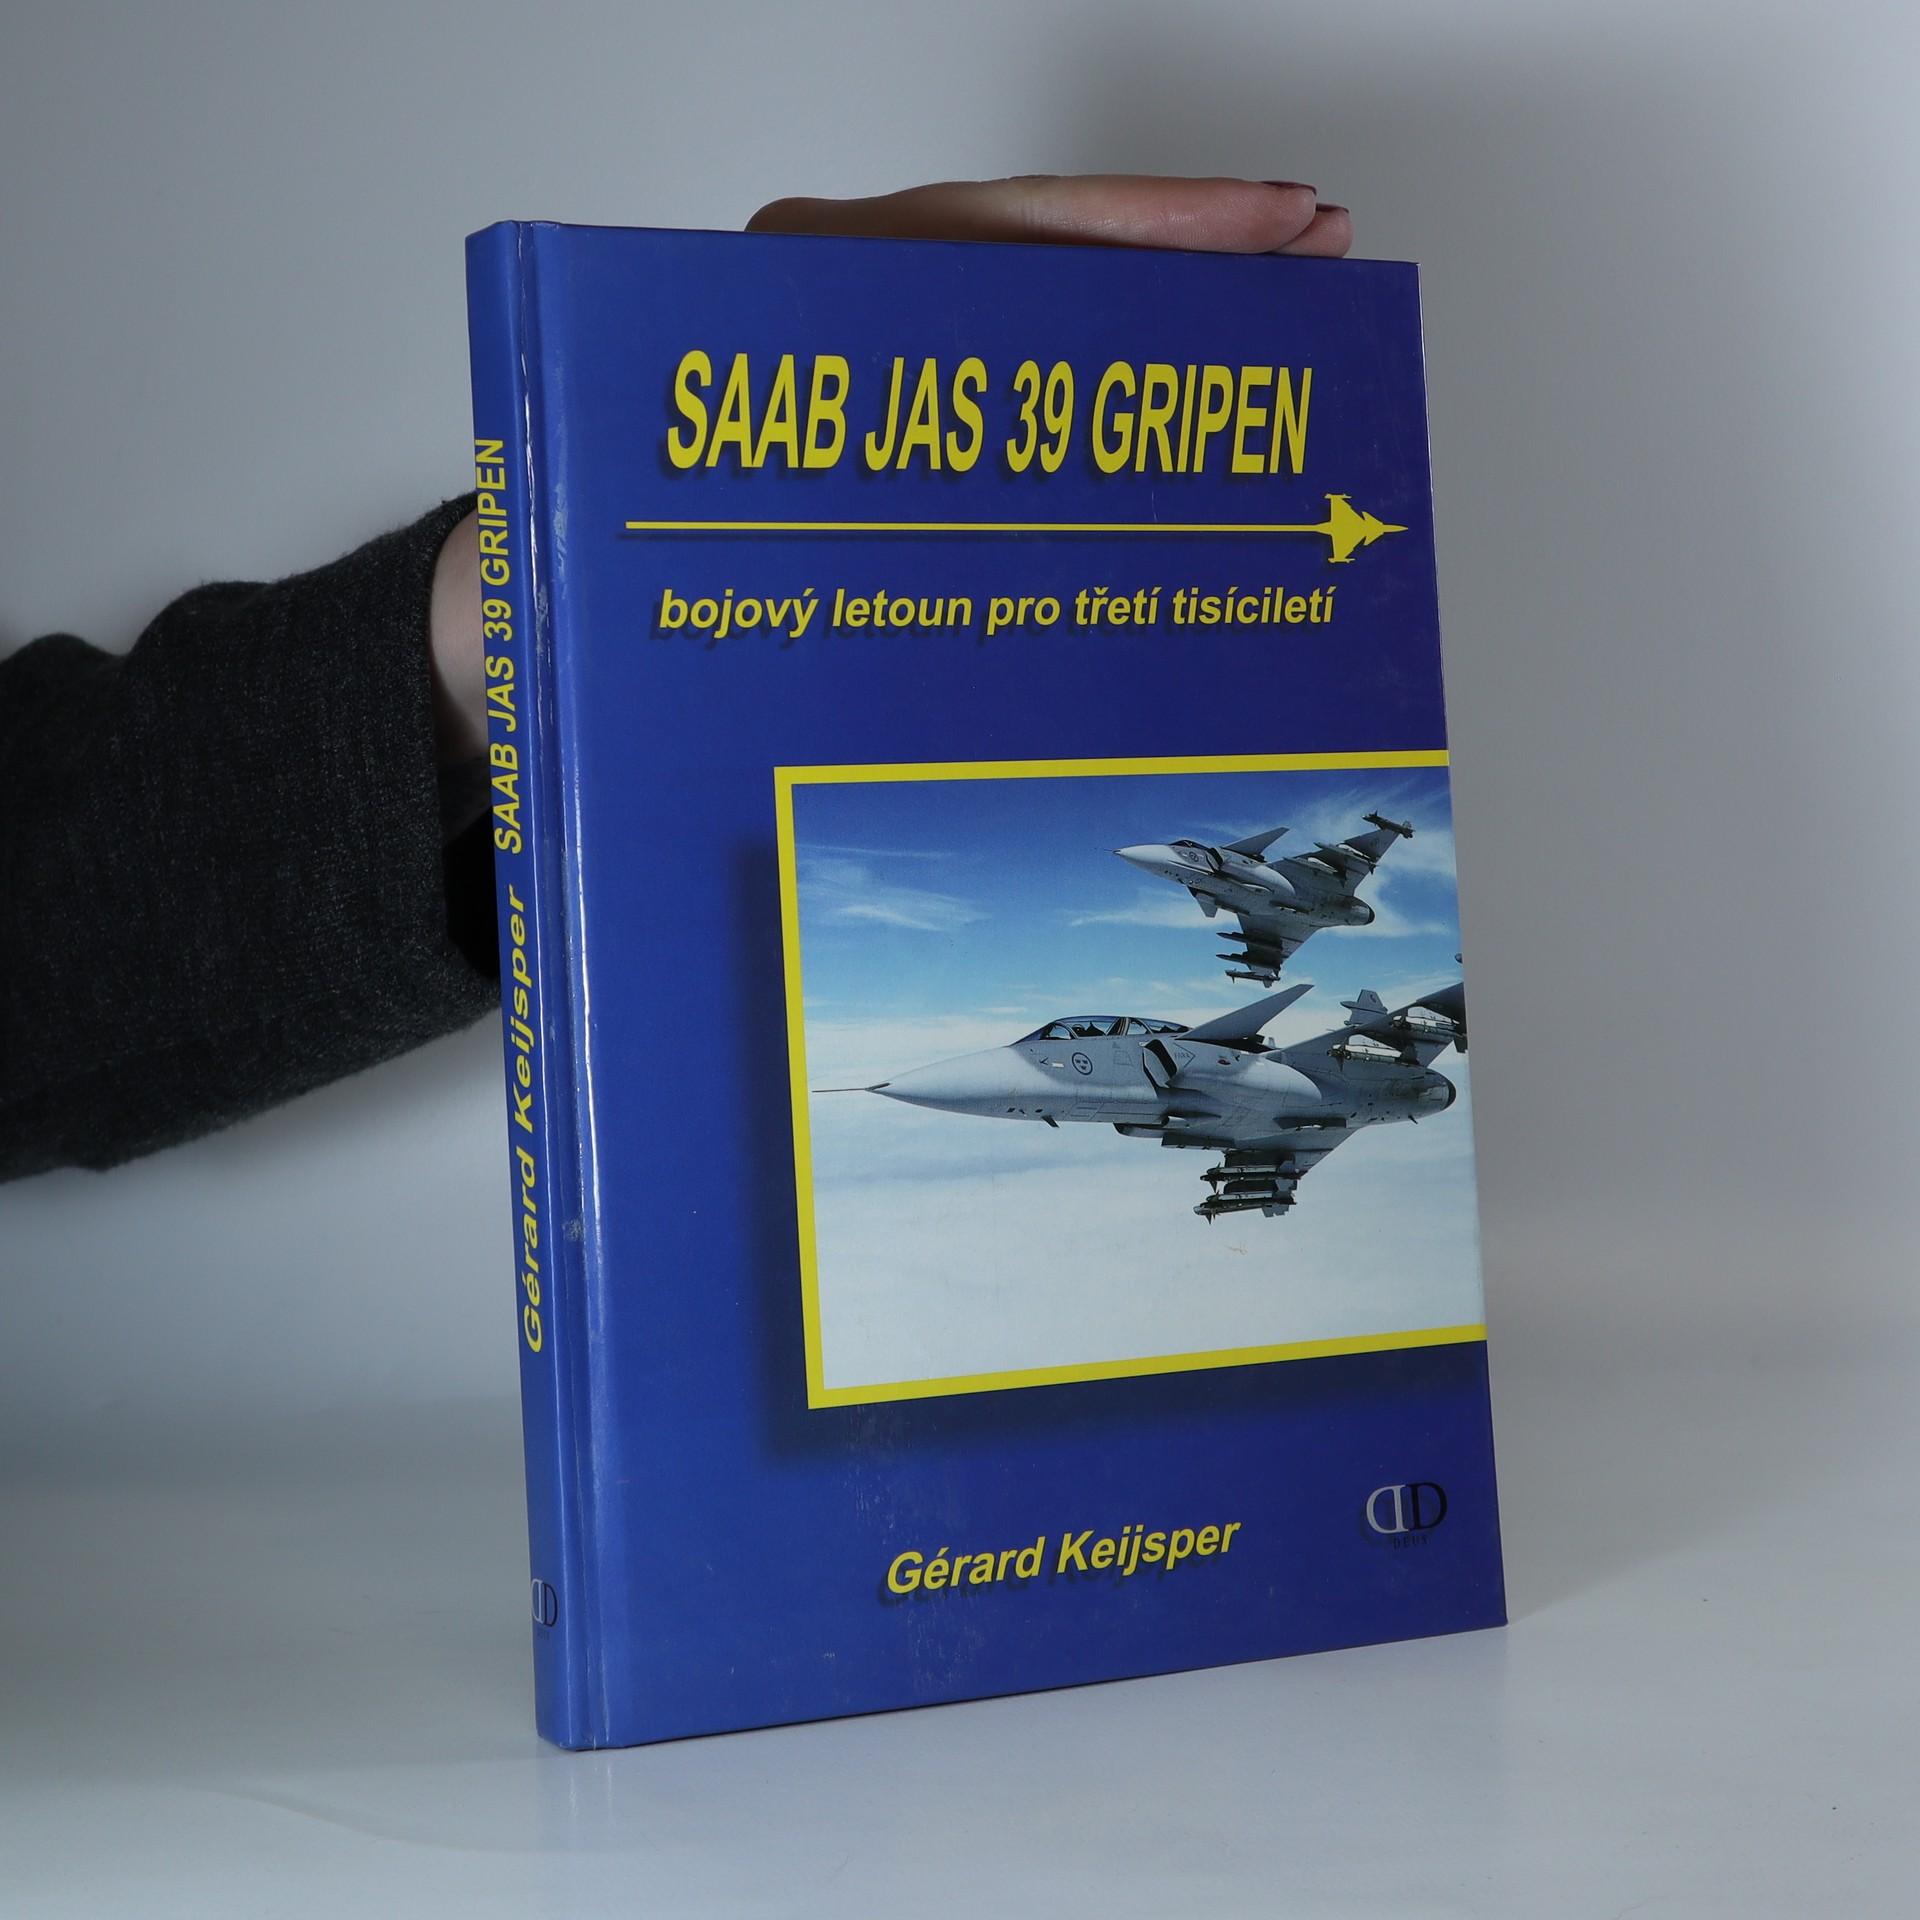 antikvární kniha Saab JAS 39 Gripen. Bojový letoun pro třetí tisíciletí, 2000